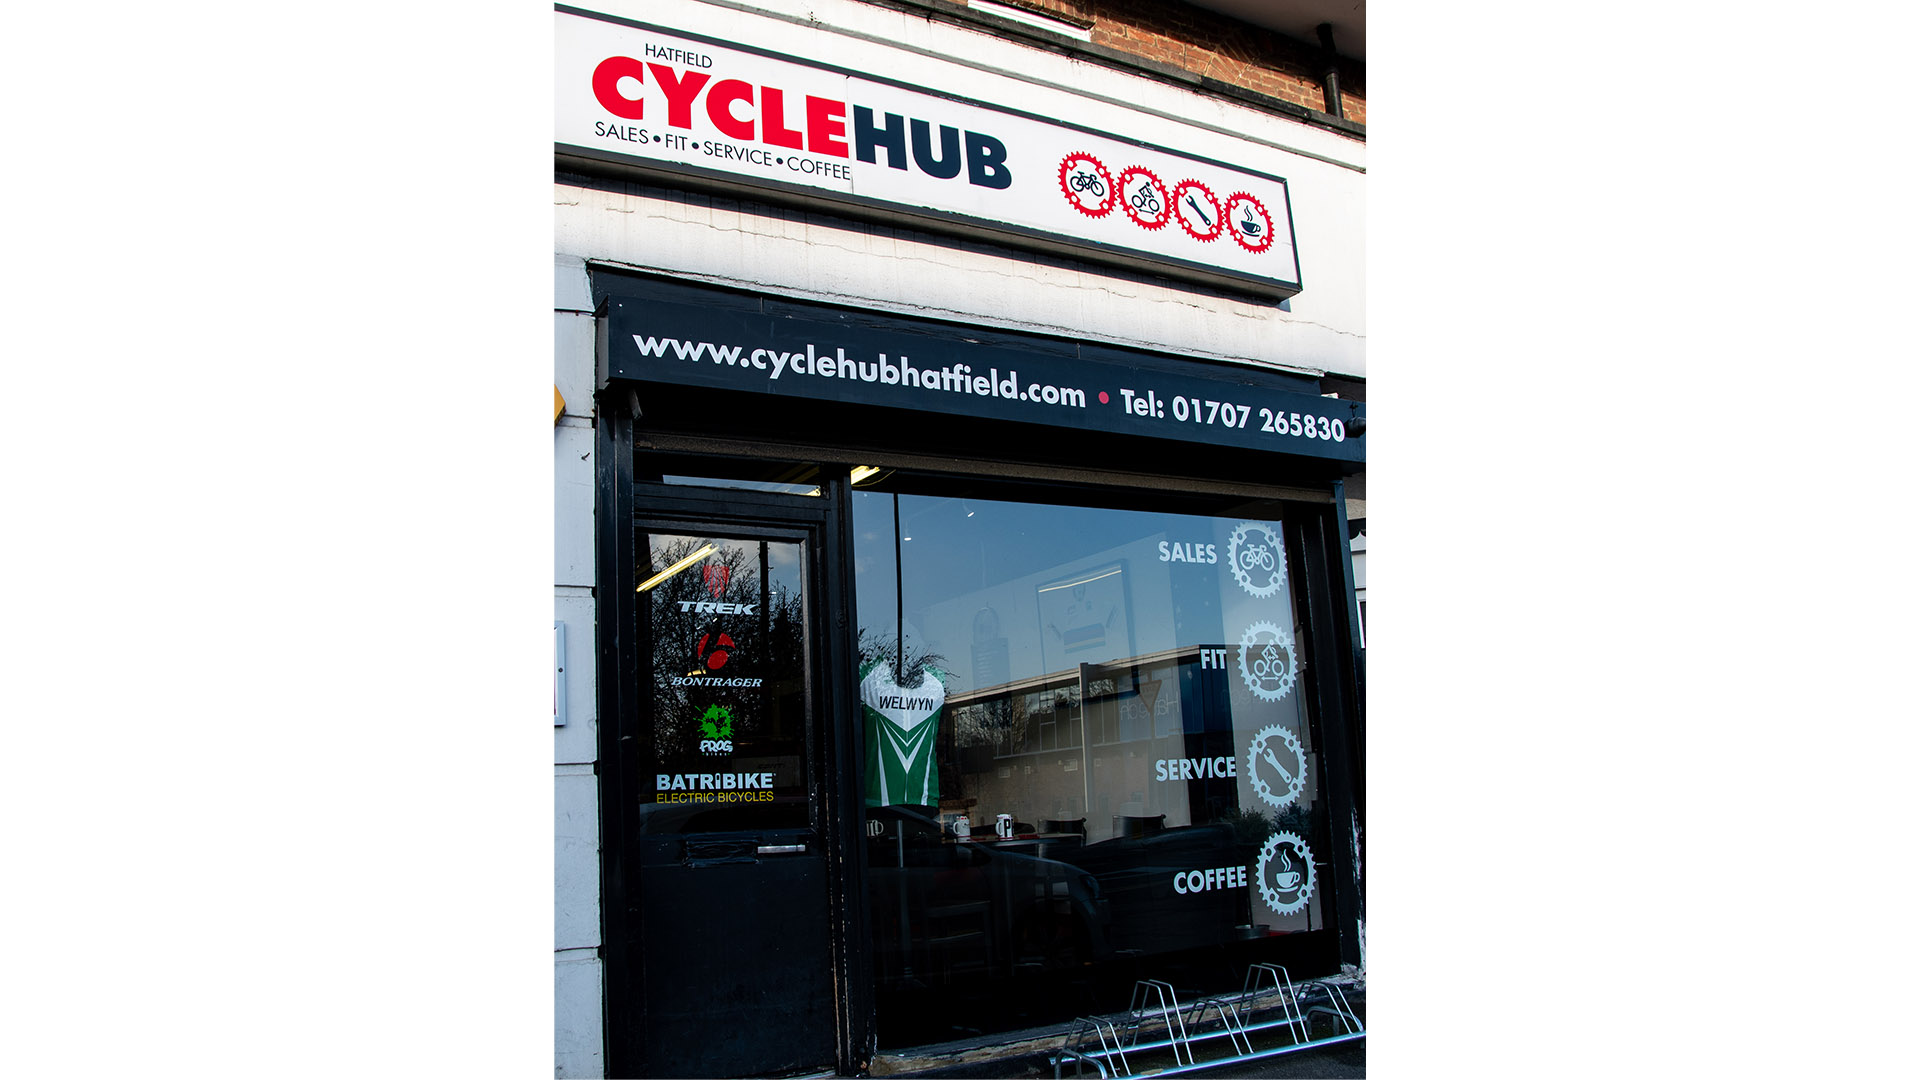 Hatfield Cycle Hub shopfront